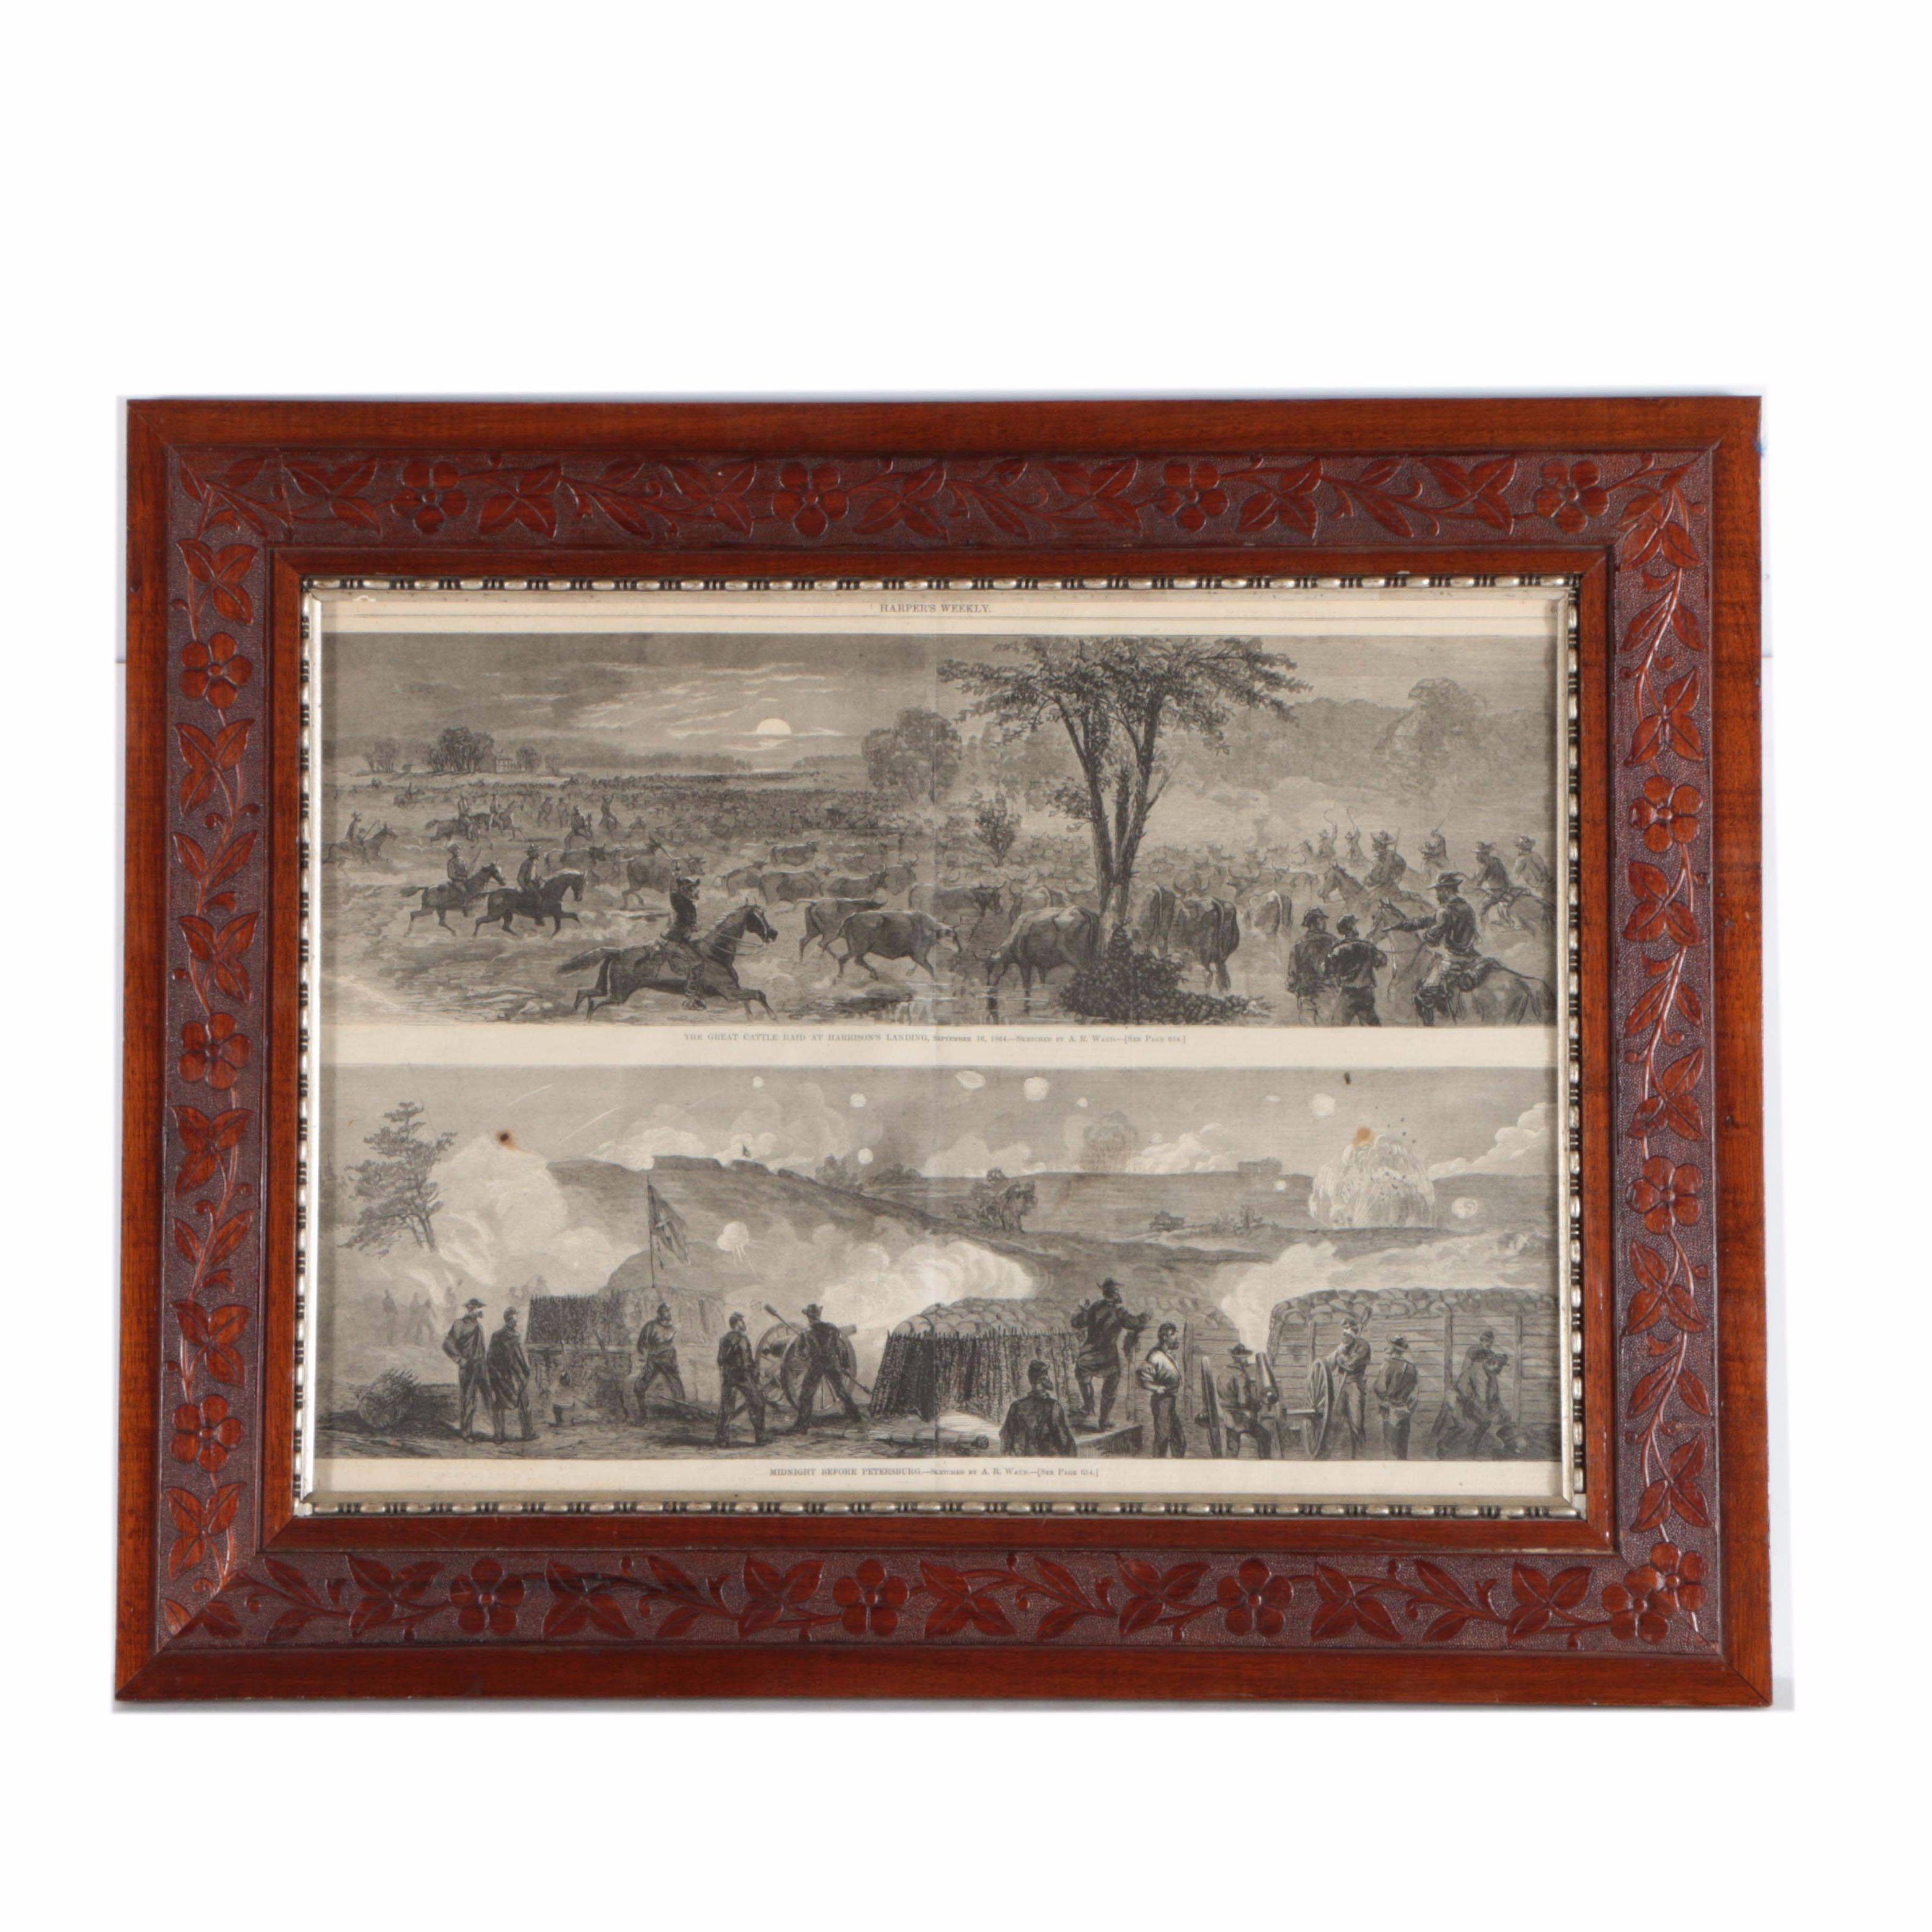 Harper's Weekly Engravings on Paper Depicting Scenes from the American Civil War